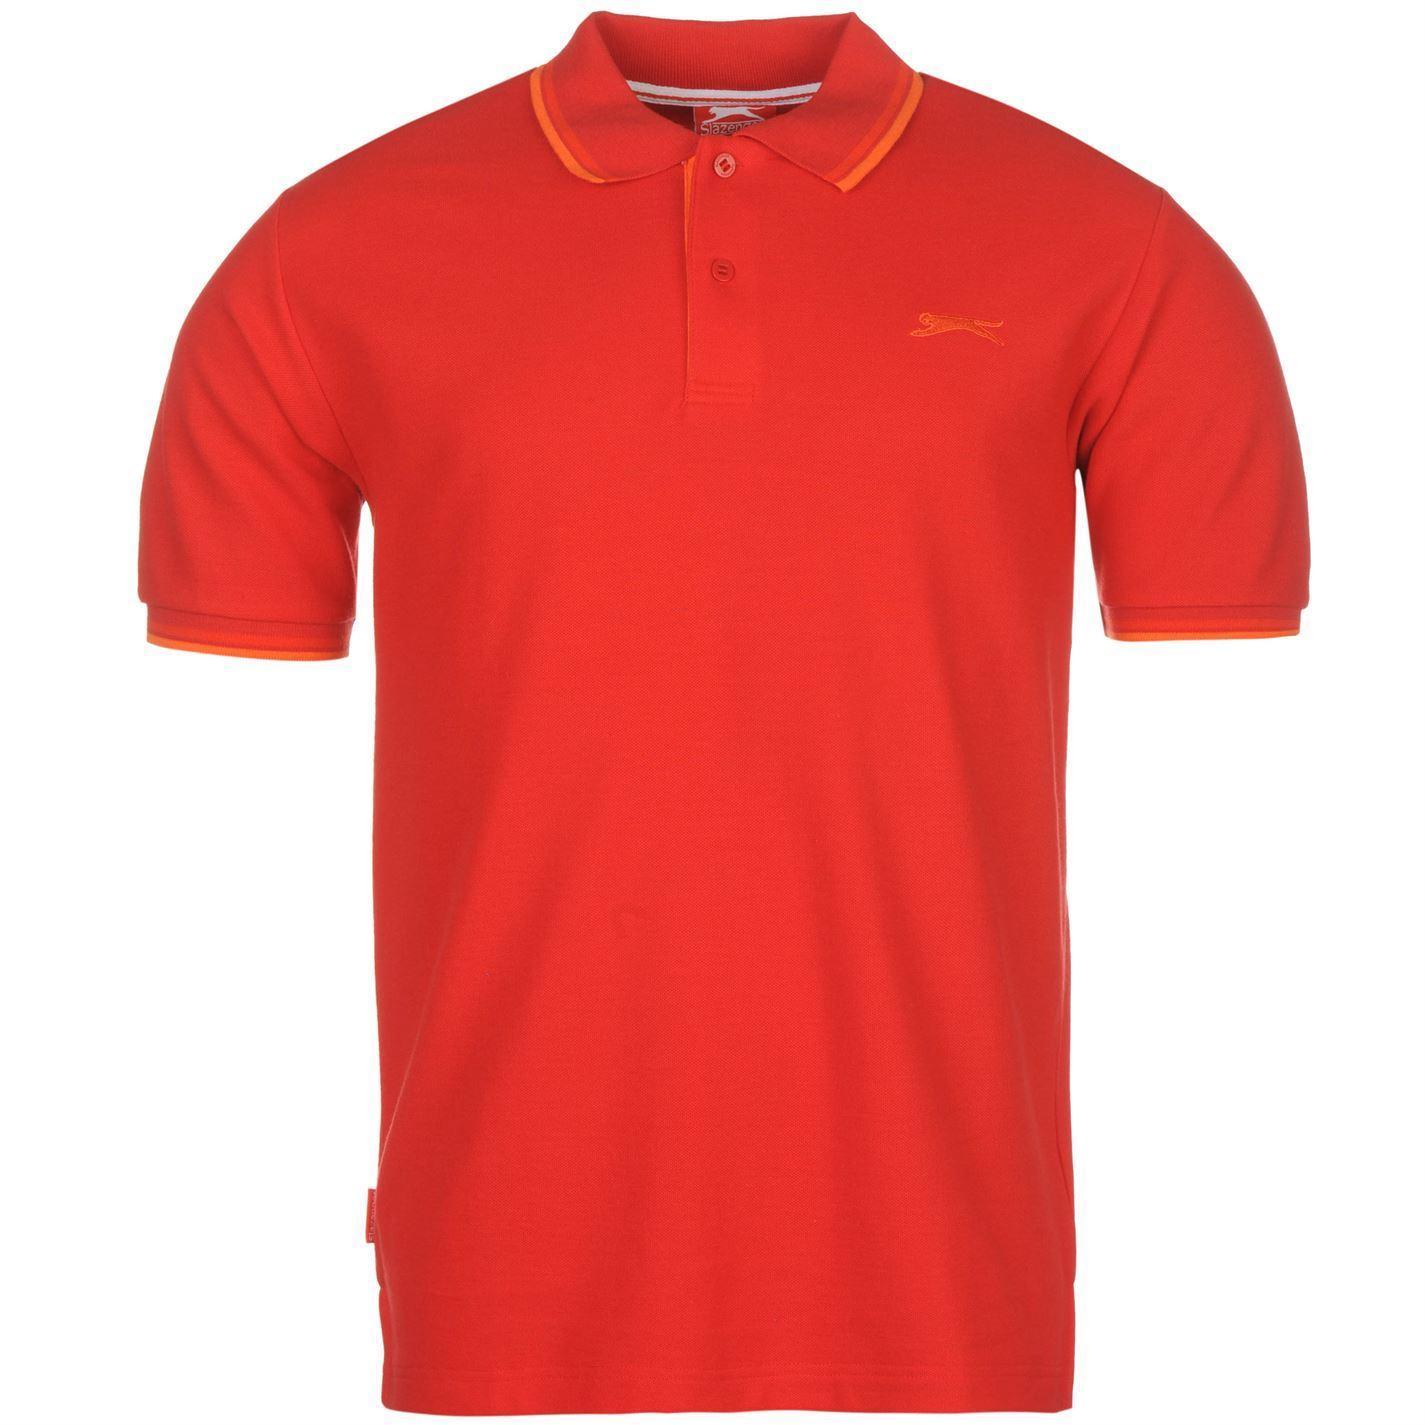 Slazenger-Mens-Tipped-Polo-Shirt-Short-Sleeve-Classic-Fit-Tee